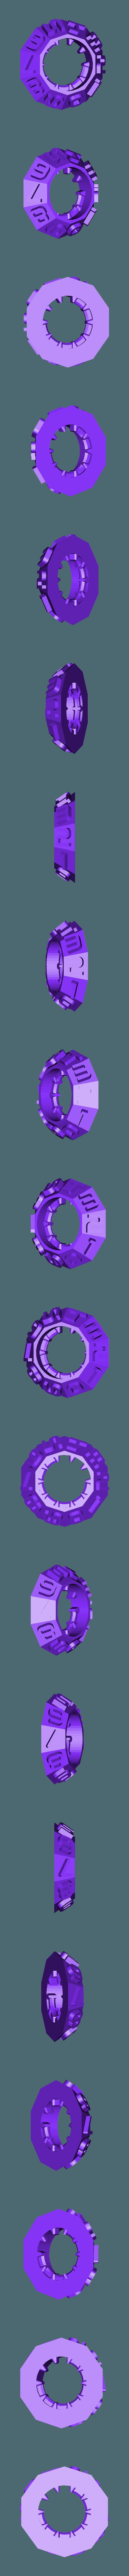 8R-9L.stl Download free STL file Latch Cryptex - Cerrojo • 3D printable design, xutano